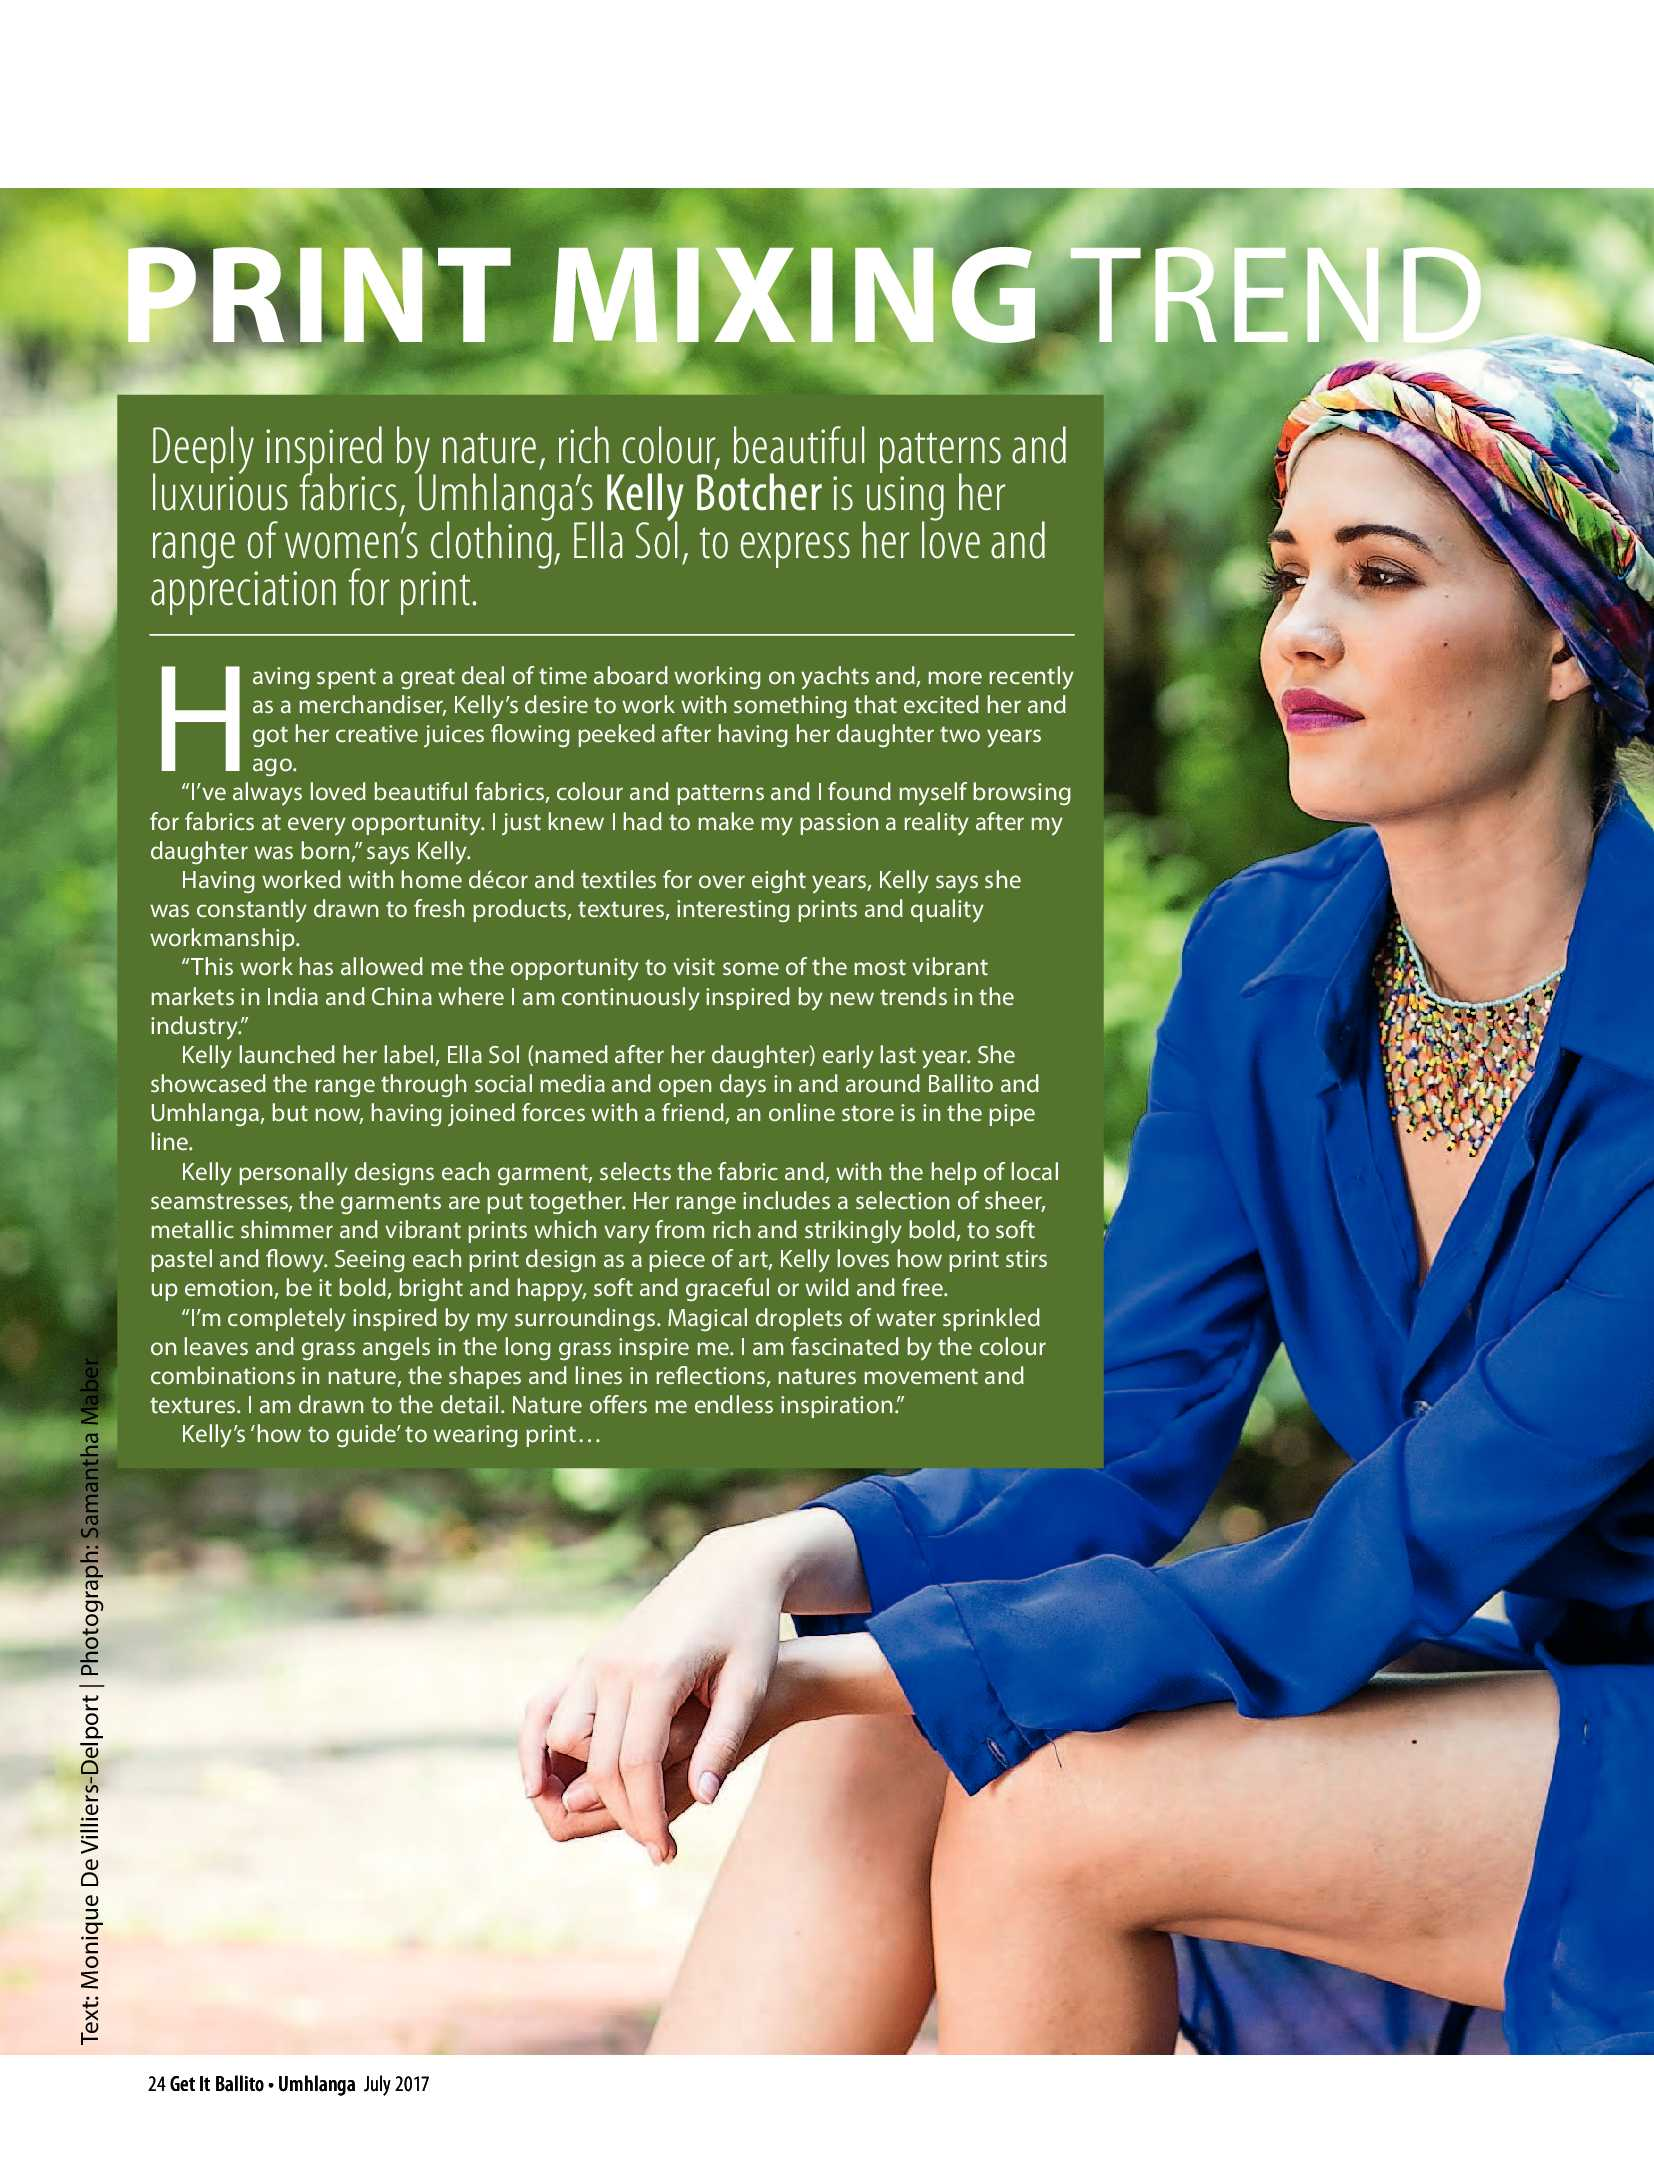 get-magazine-ballitoumhlanga-july-2017-2-epapers-page-26